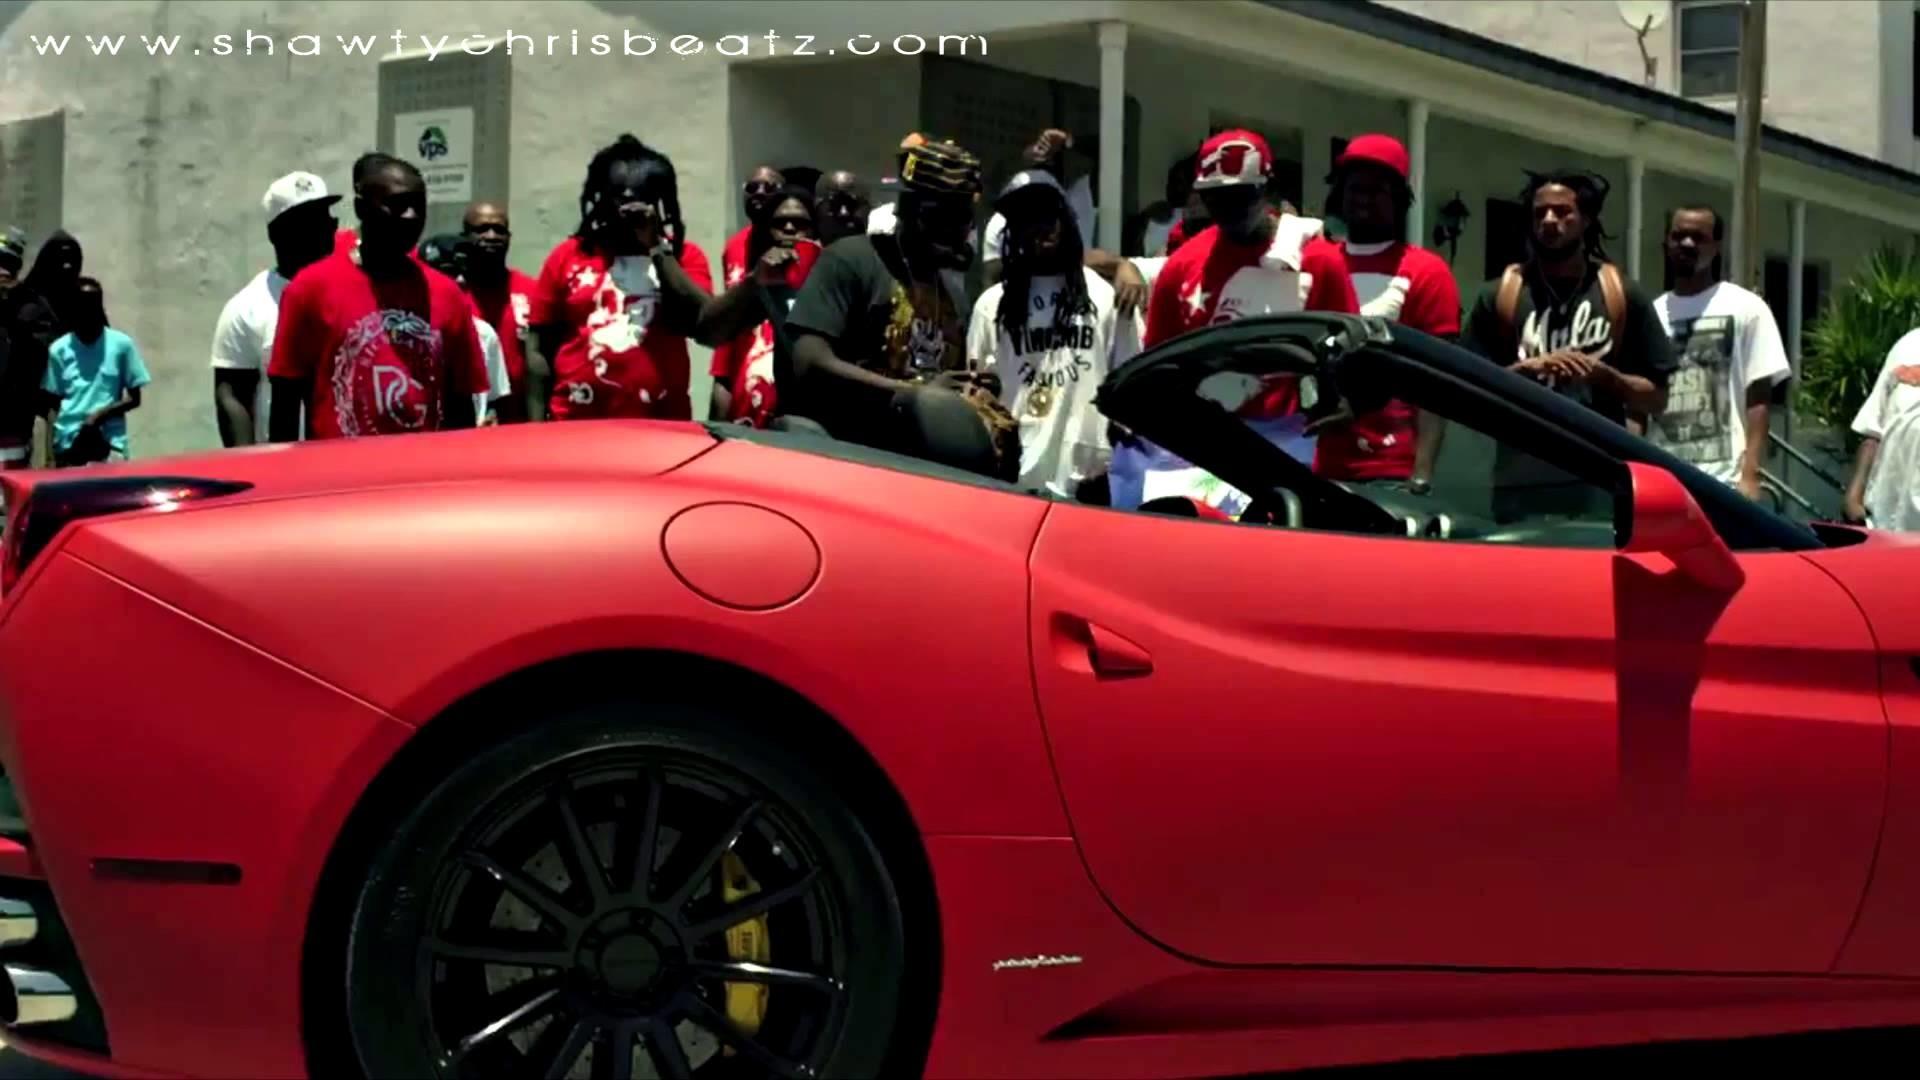 Rich Homie Quan / Young Thug / Rich Gang Type Trap Beat – SkoolyGang  (ShawtyChrisBeatz) *2015*